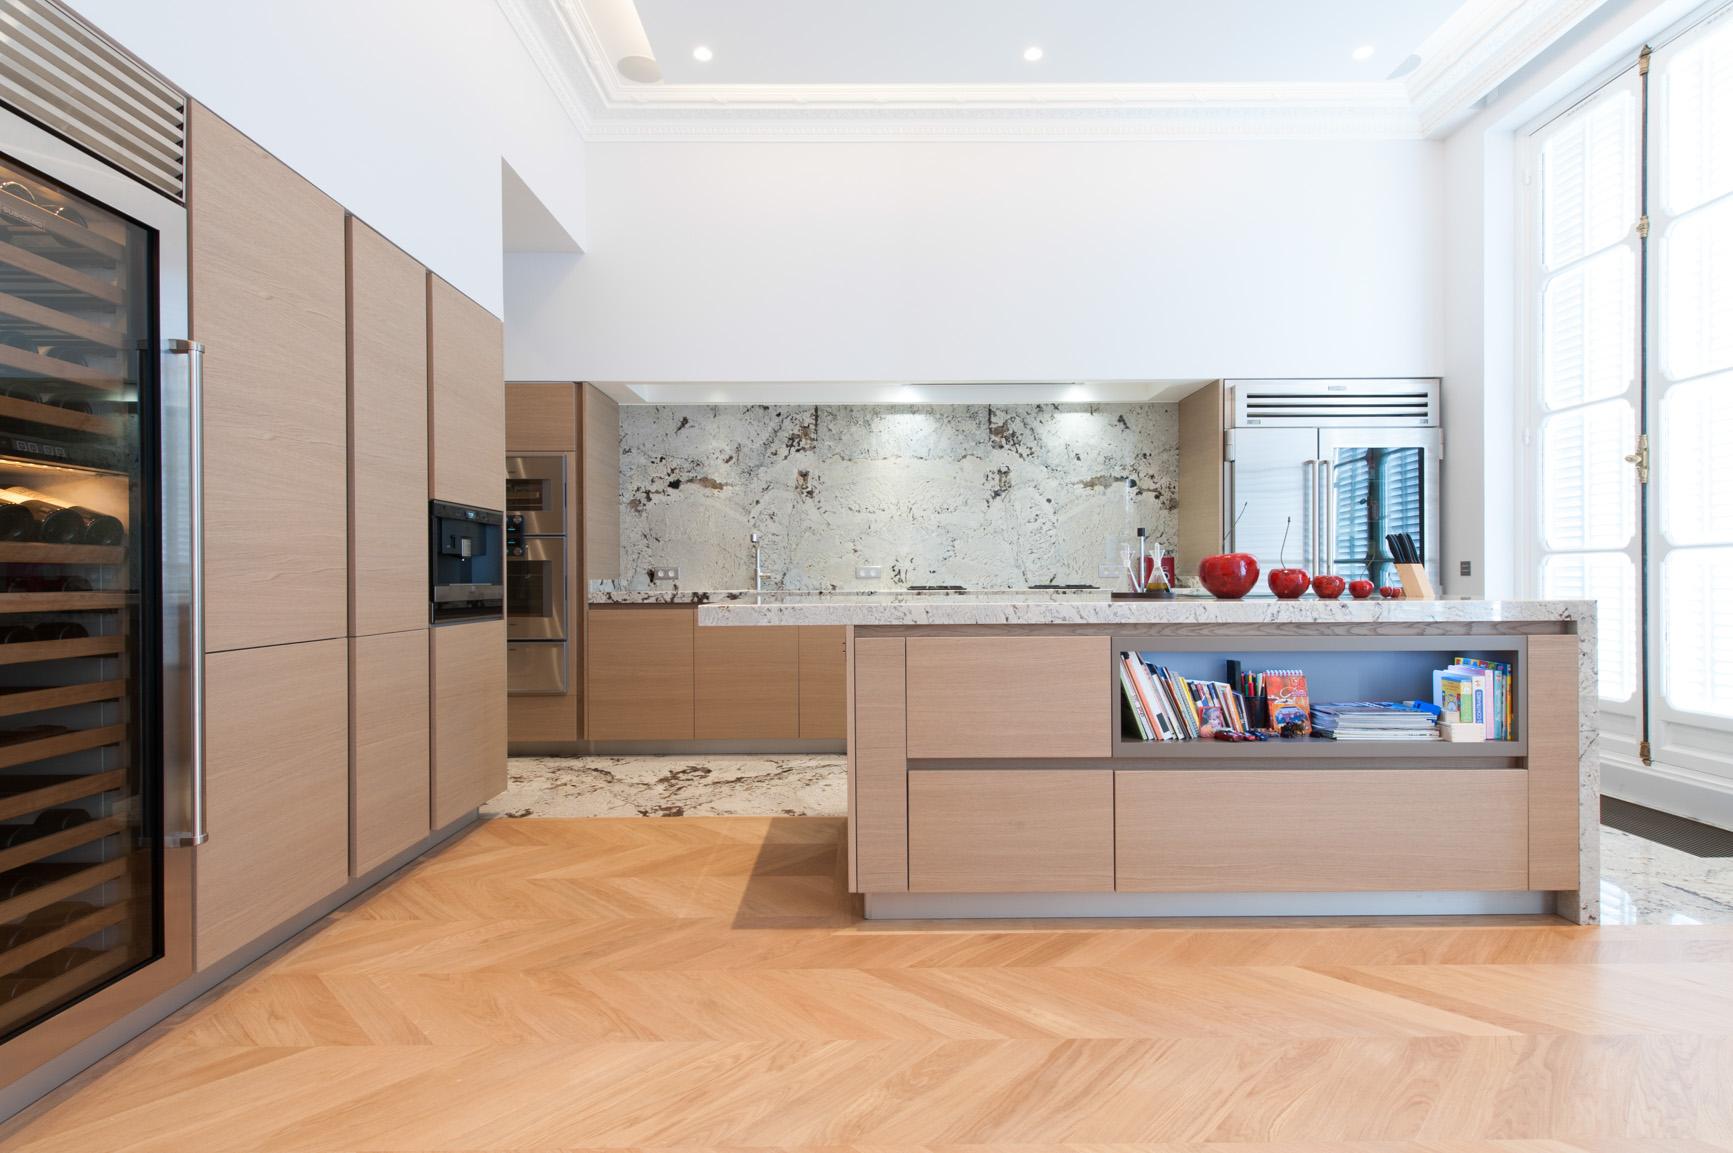 appartement paris 16e agence keller. Black Bedroom Furniture Sets. Home Design Ideas